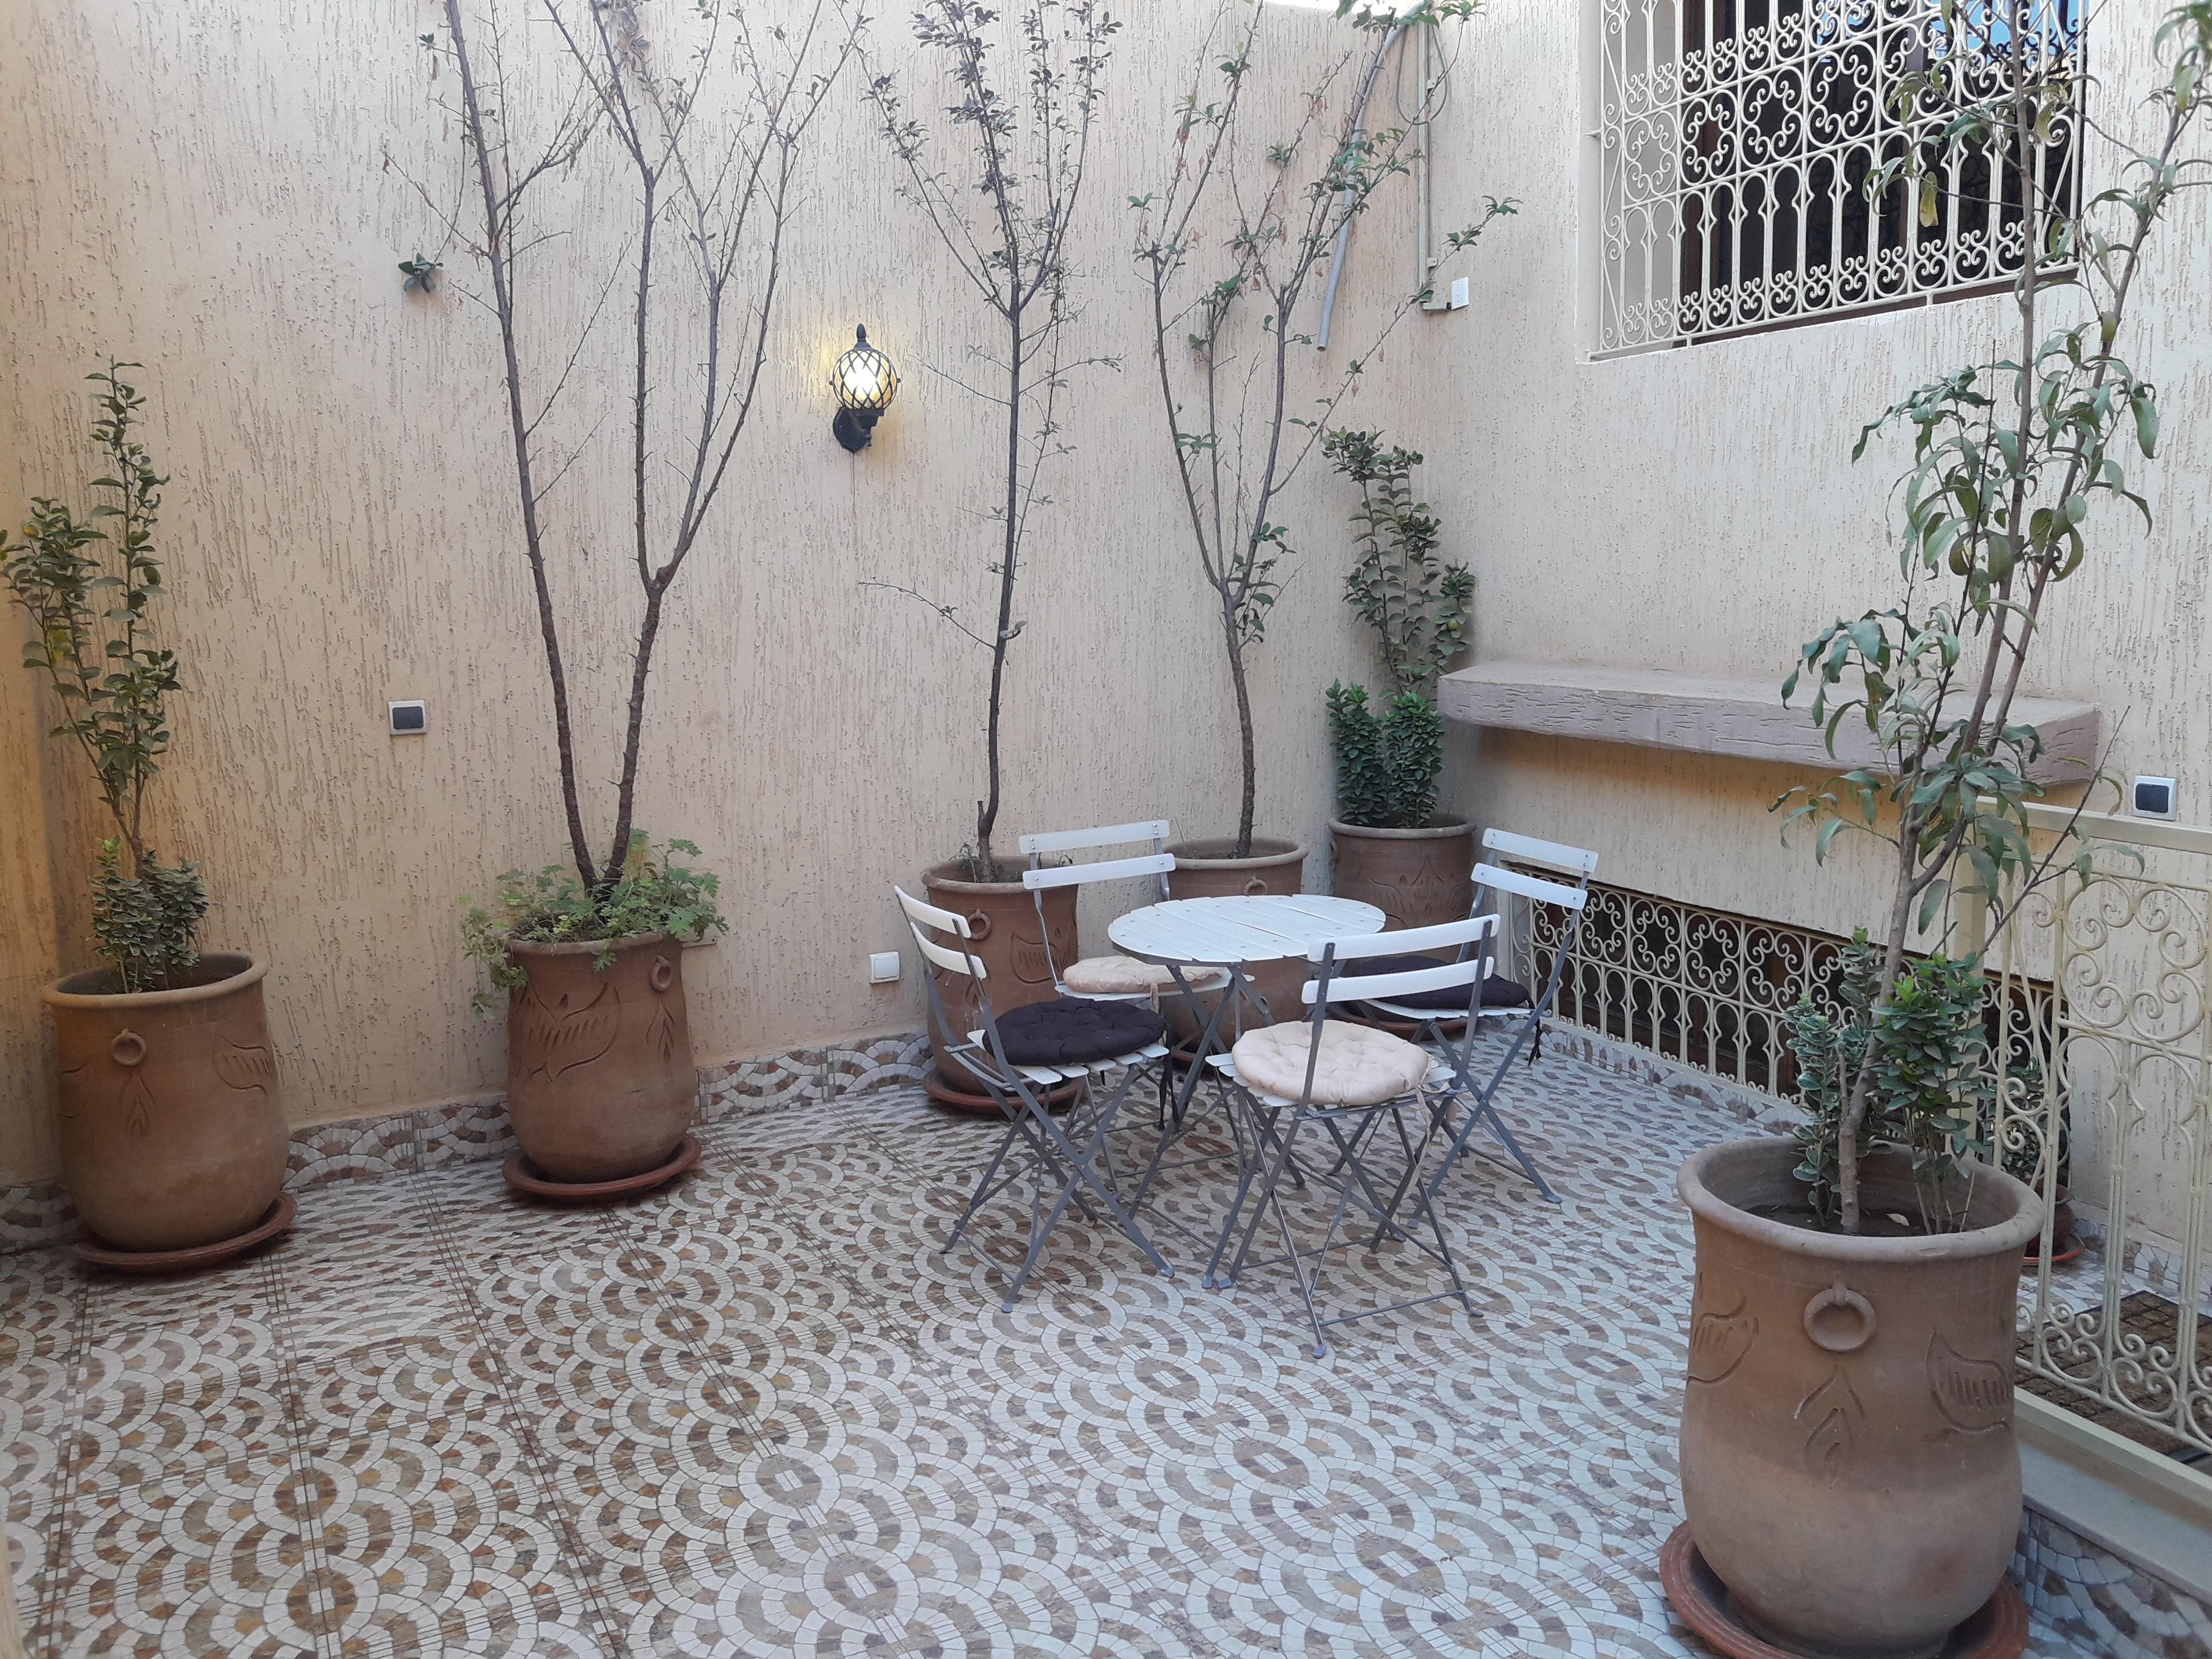 Ferienwohnung Atlasgebirge (Marokko) - FerienhausUrlaub.com